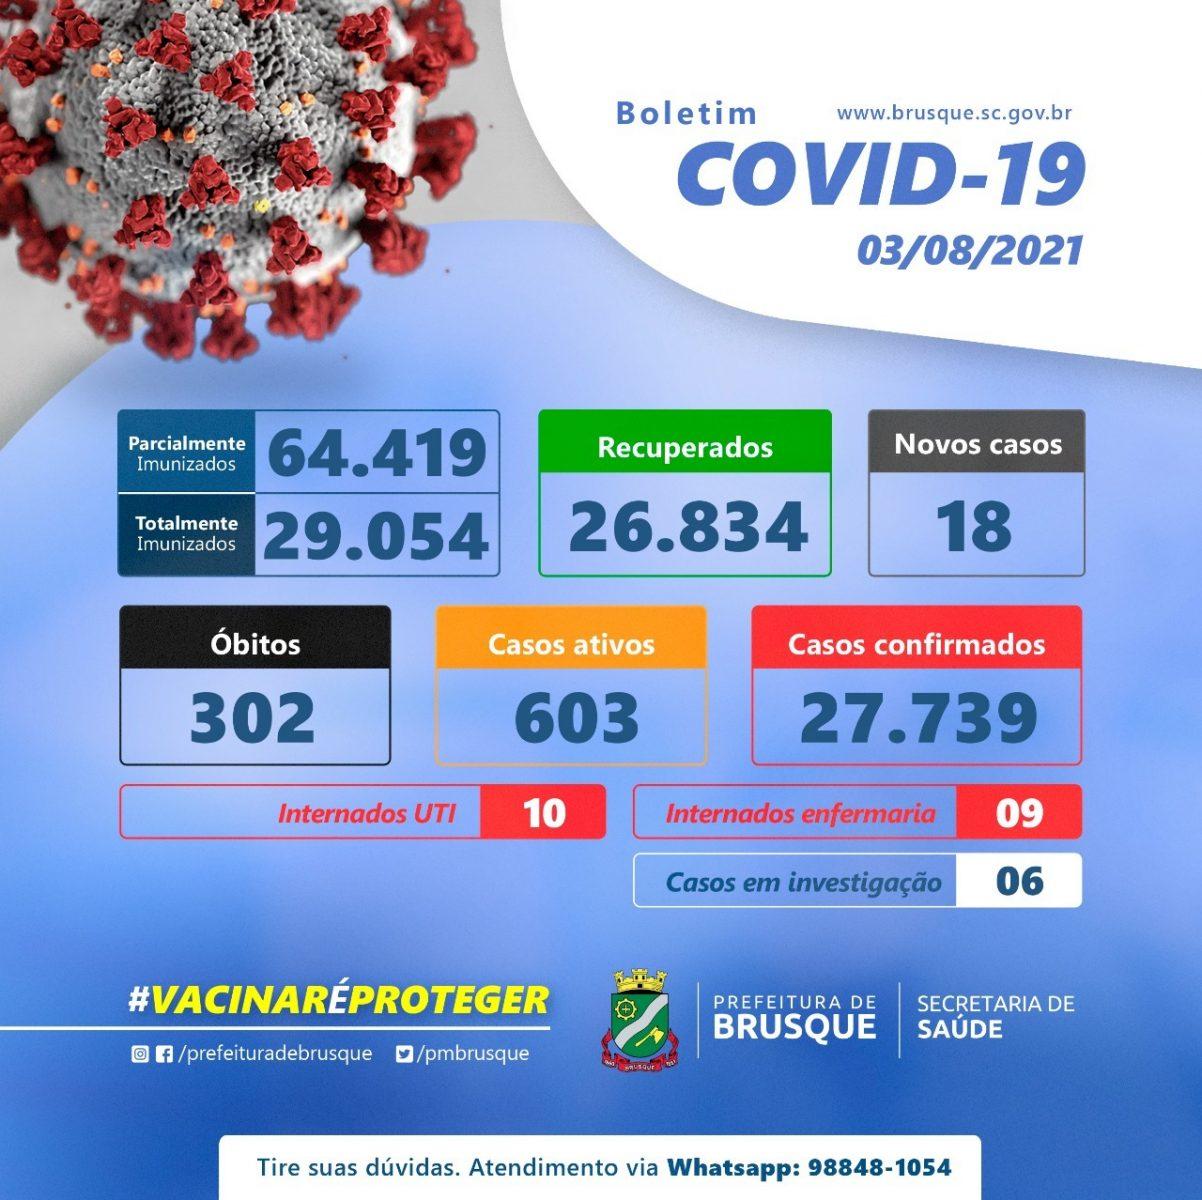 Covid-19: Confira o boletim epidemiológico desta terça-feira (03)